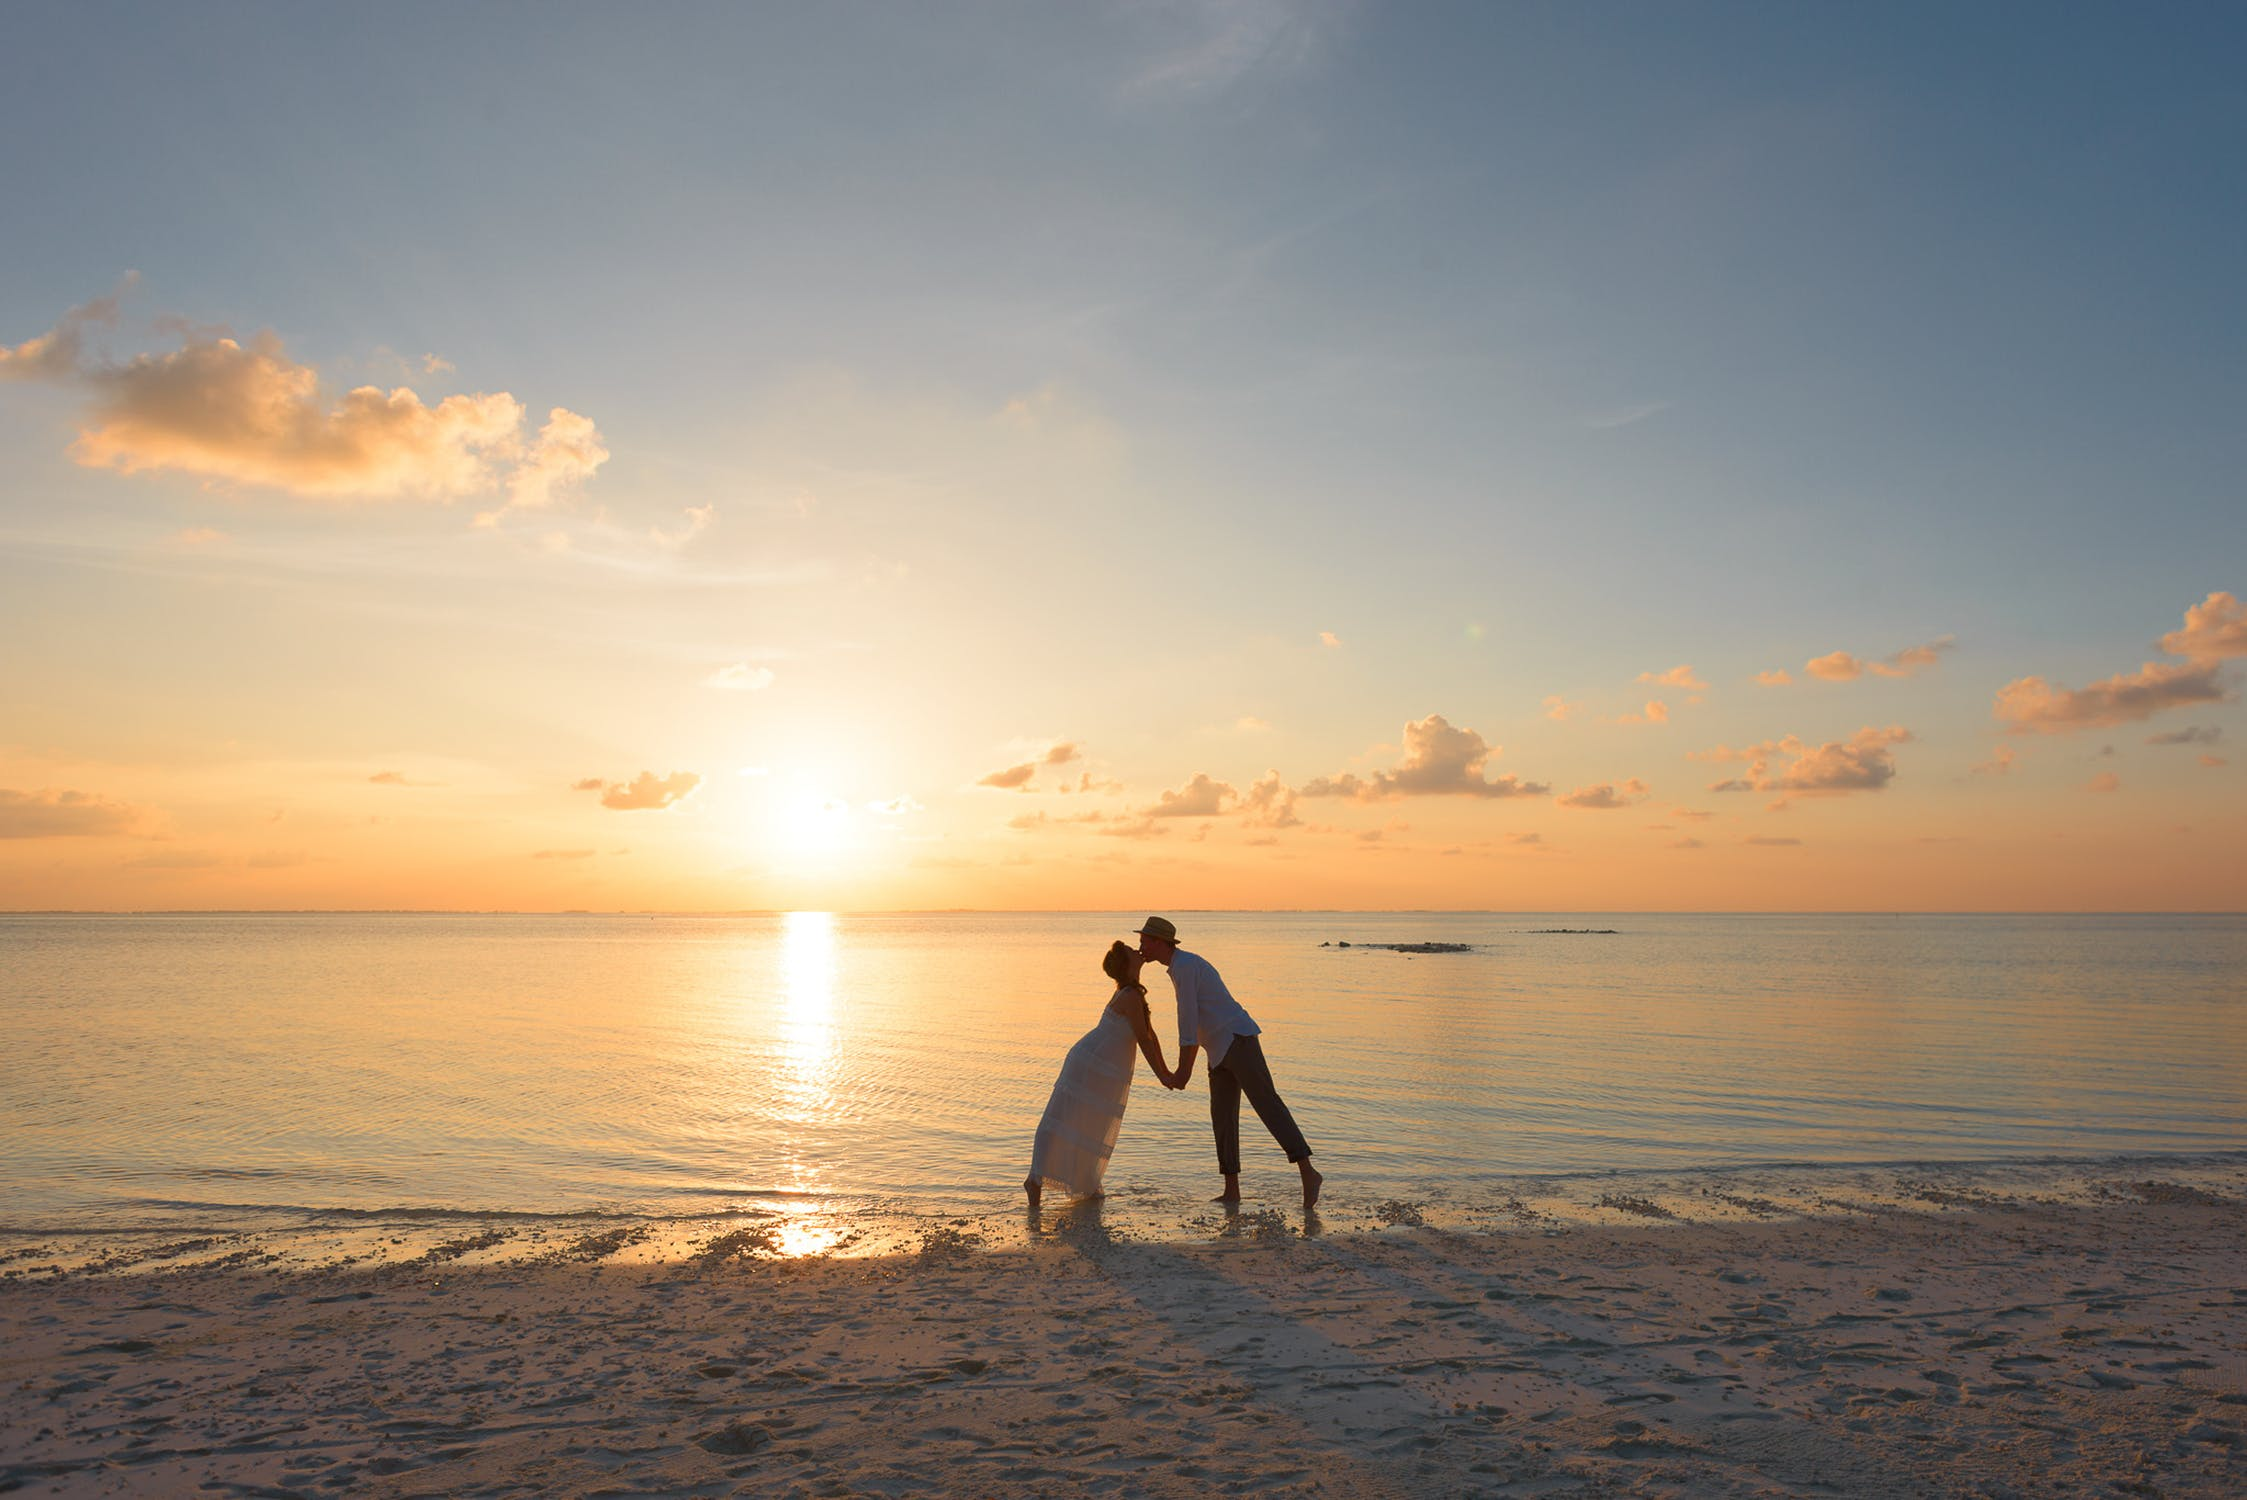 menyewa pulau untuk honeymoon